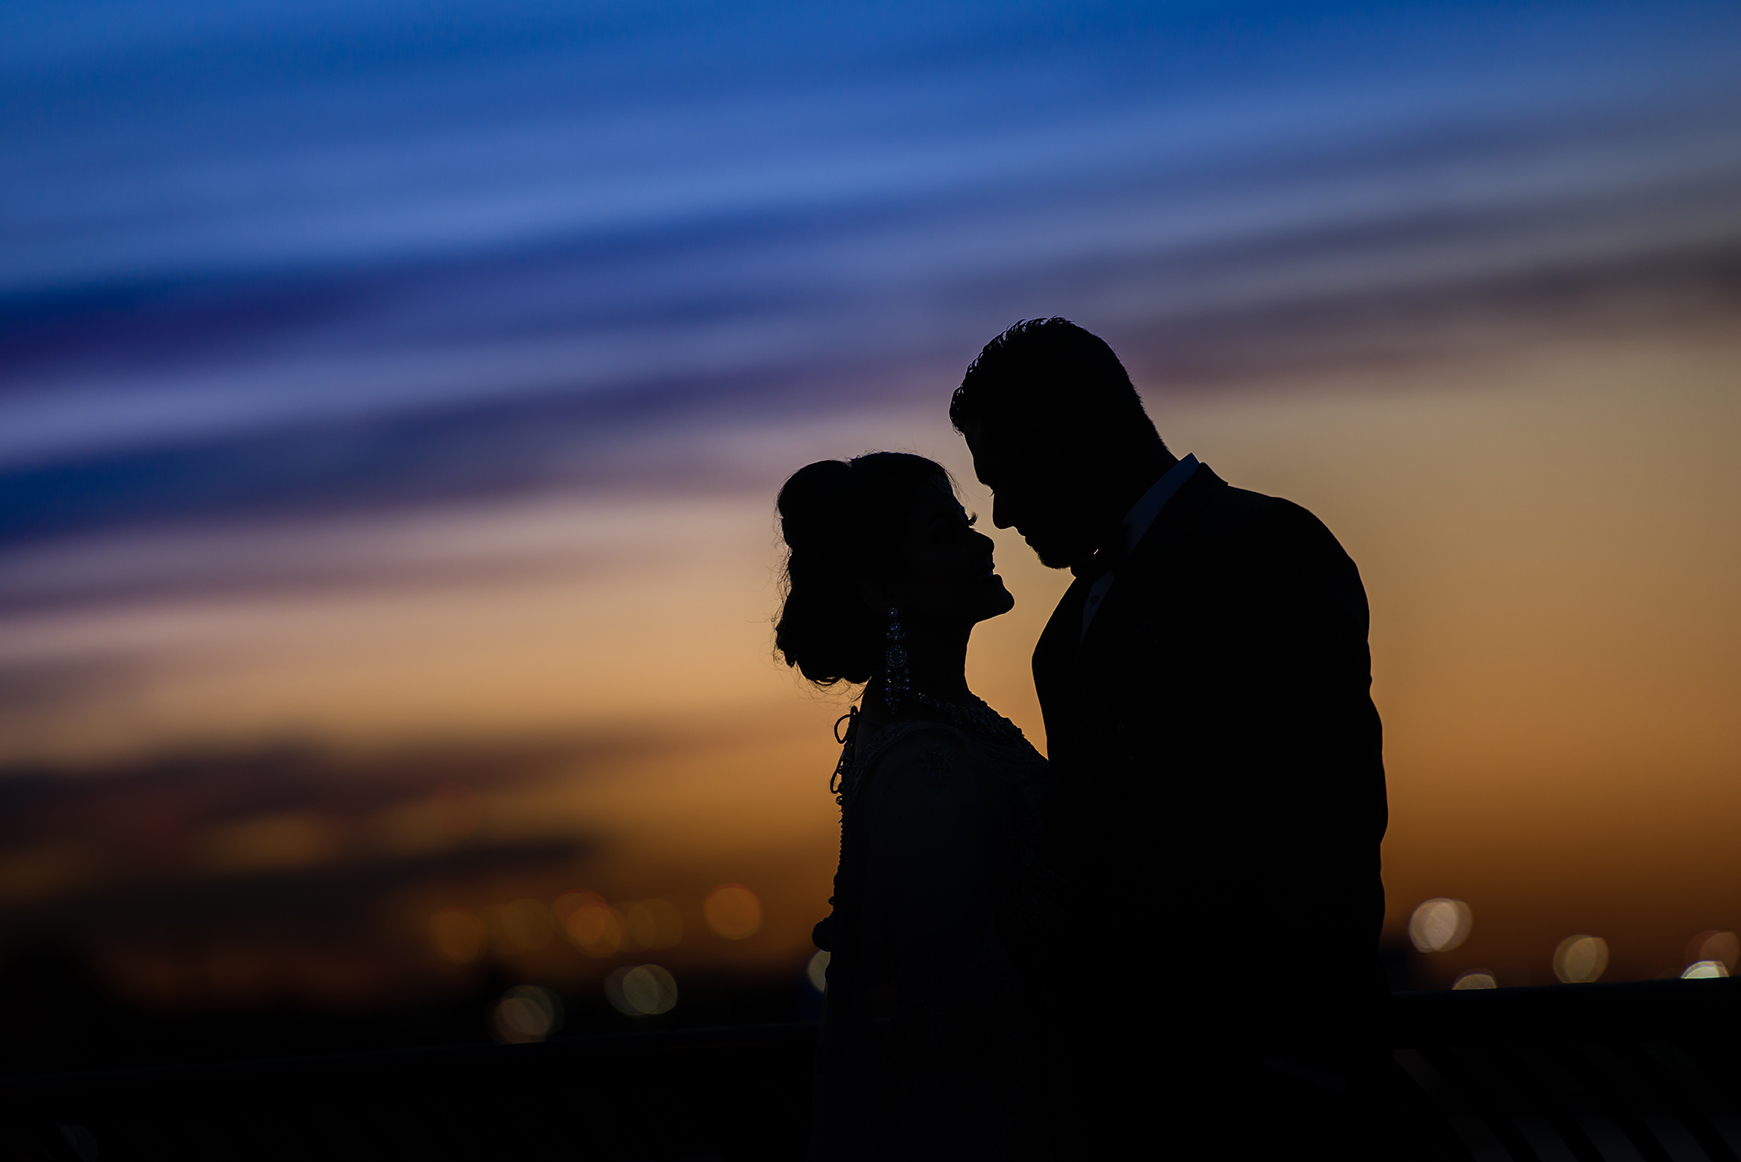 south_asian_wedding_photography_dhoom_studio_new_york17 SOUTH ASIAN WEDDINGS